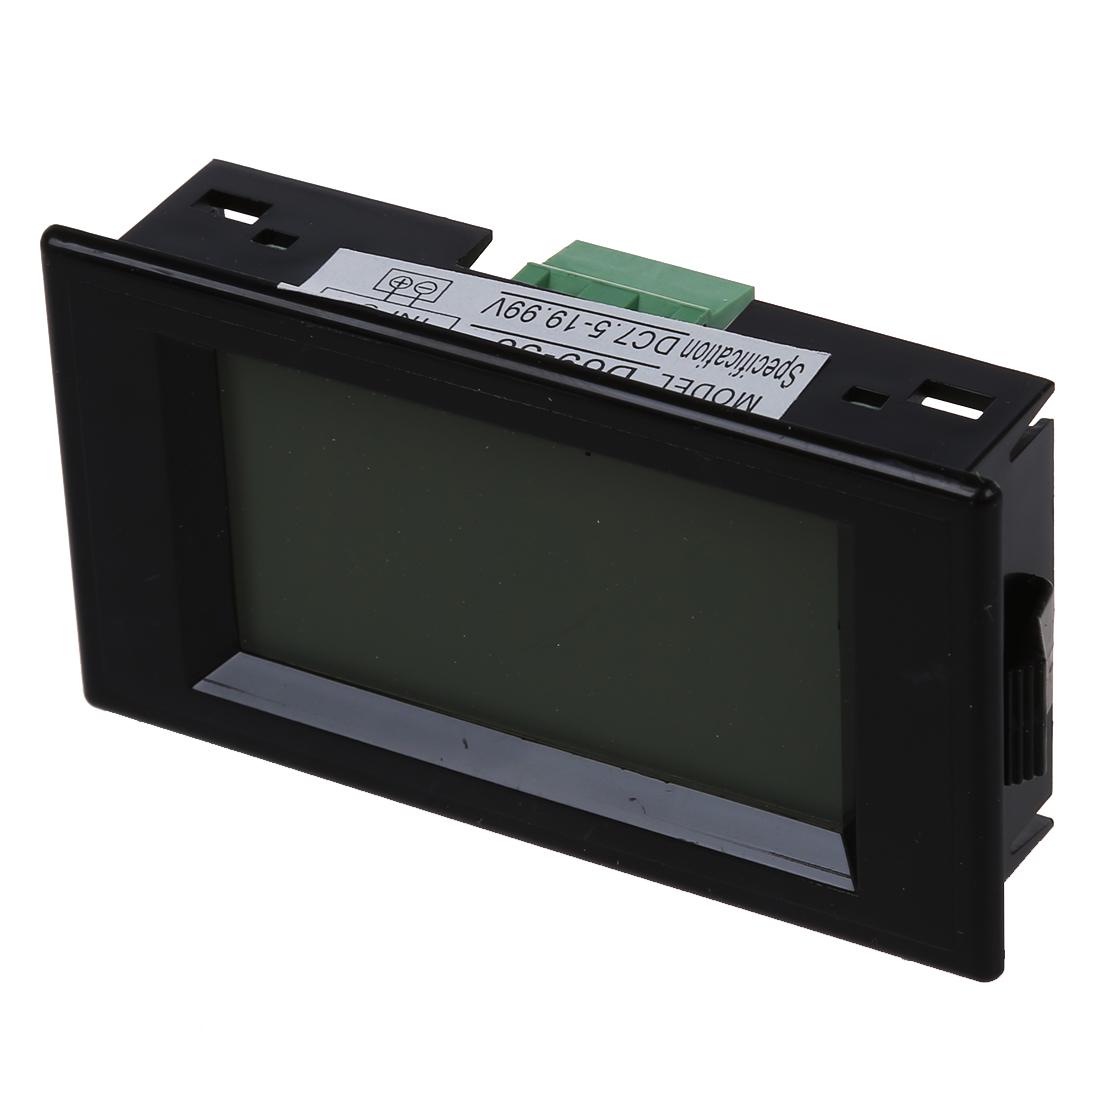 Lcd Panel Meter : Blue lcd digital volt panel meter voltmeter v j r